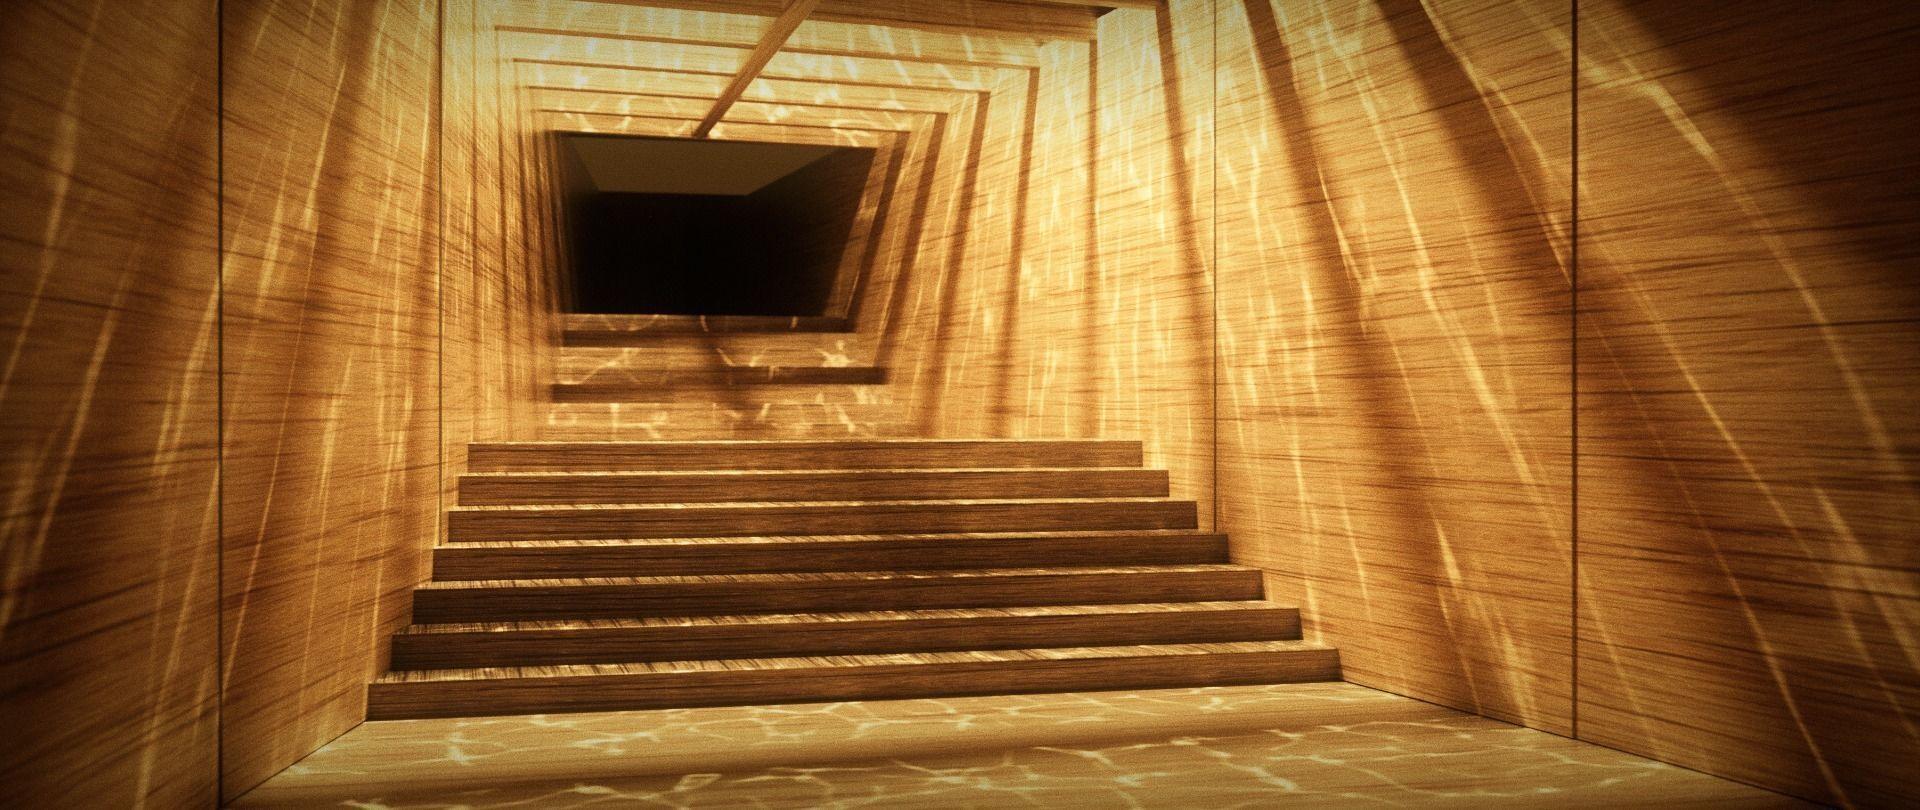 3d Caustic Corridor Blade Runner 2049 Cgtrader